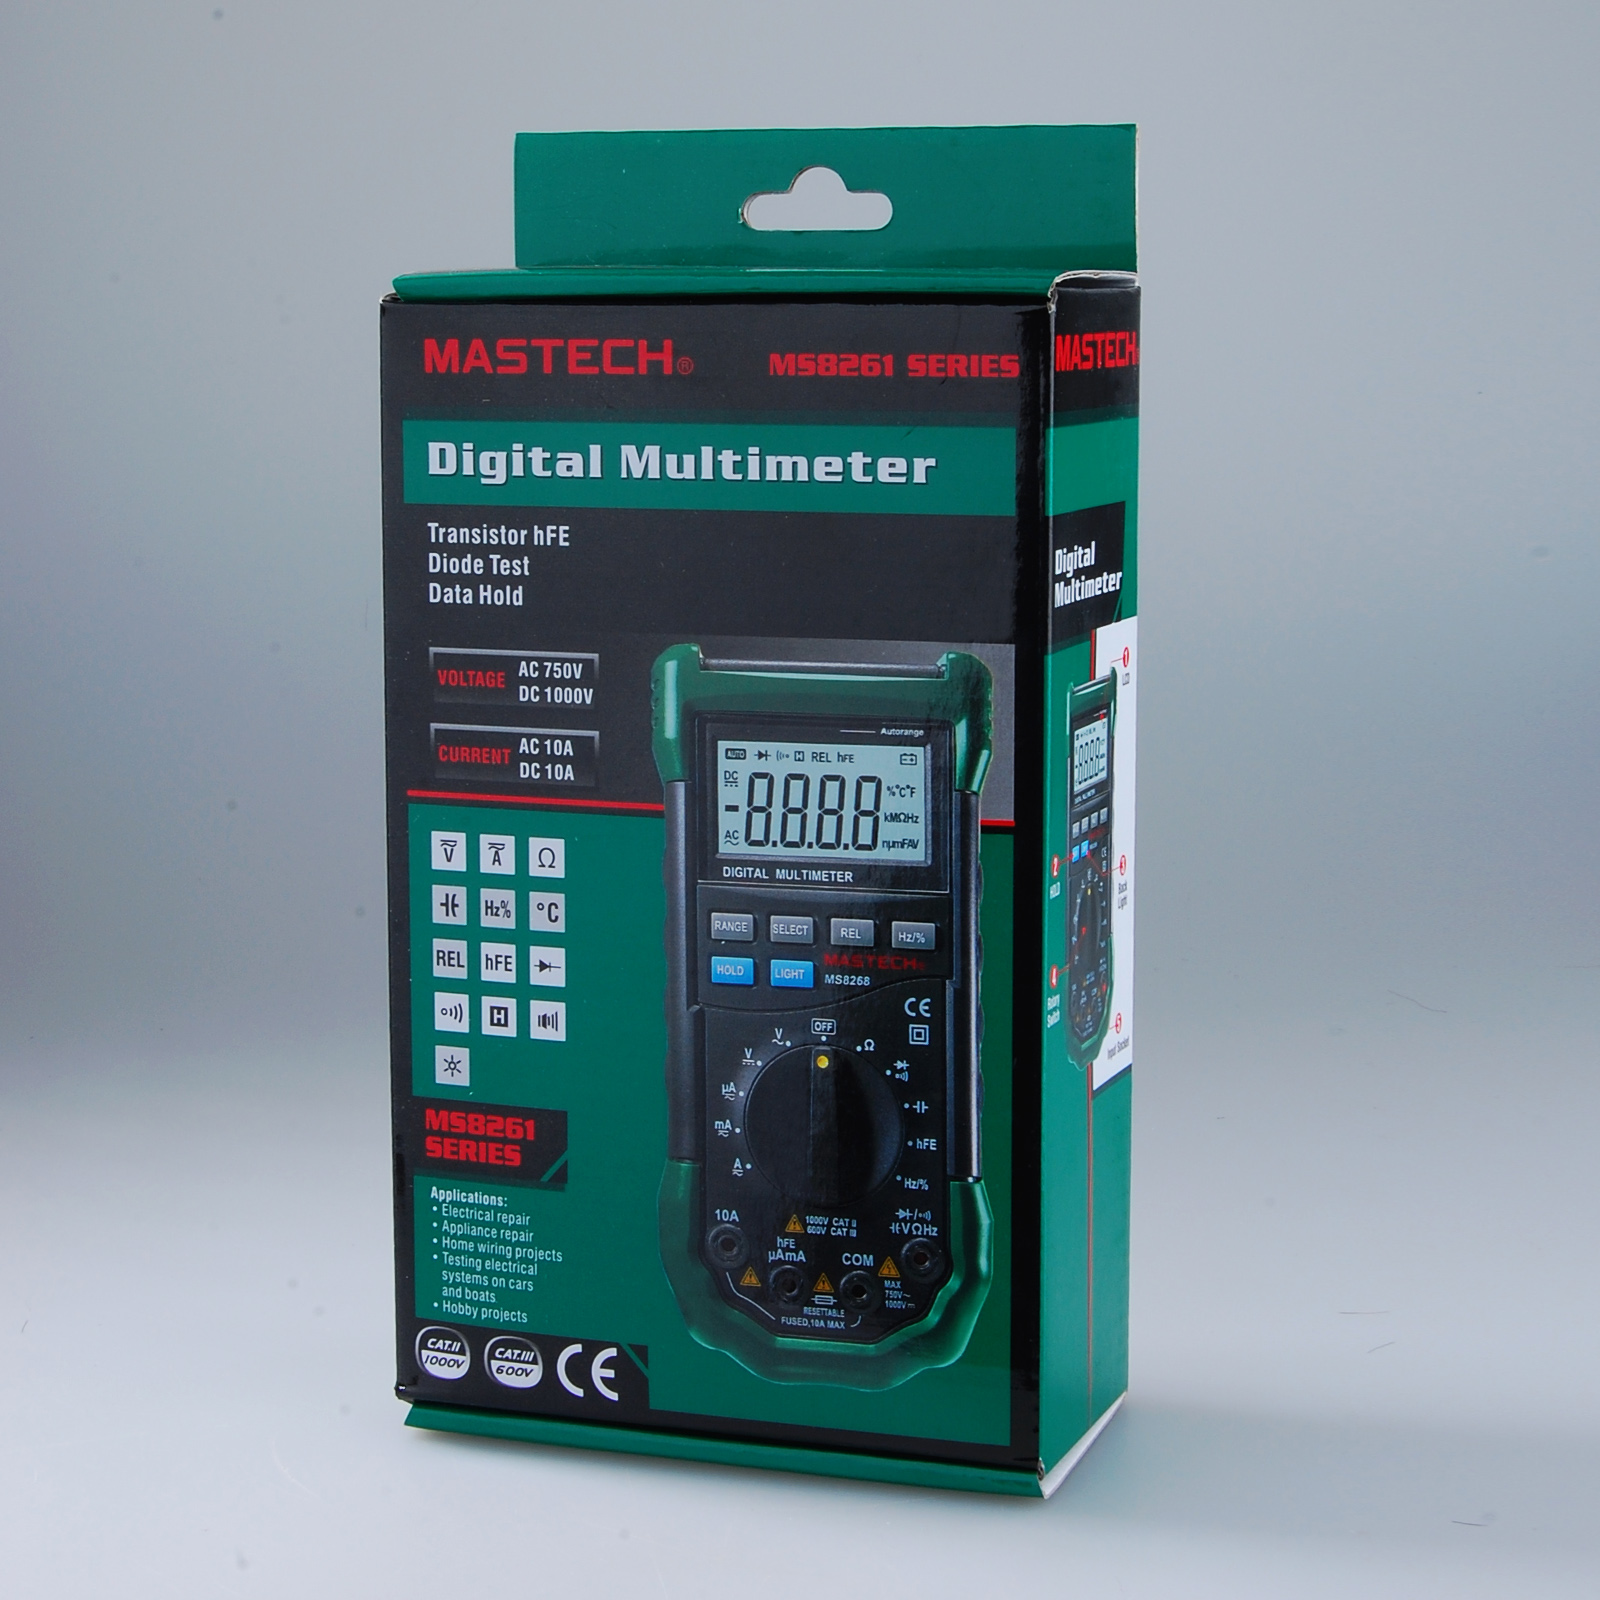 mastech ms8268 digital multimeter user manual